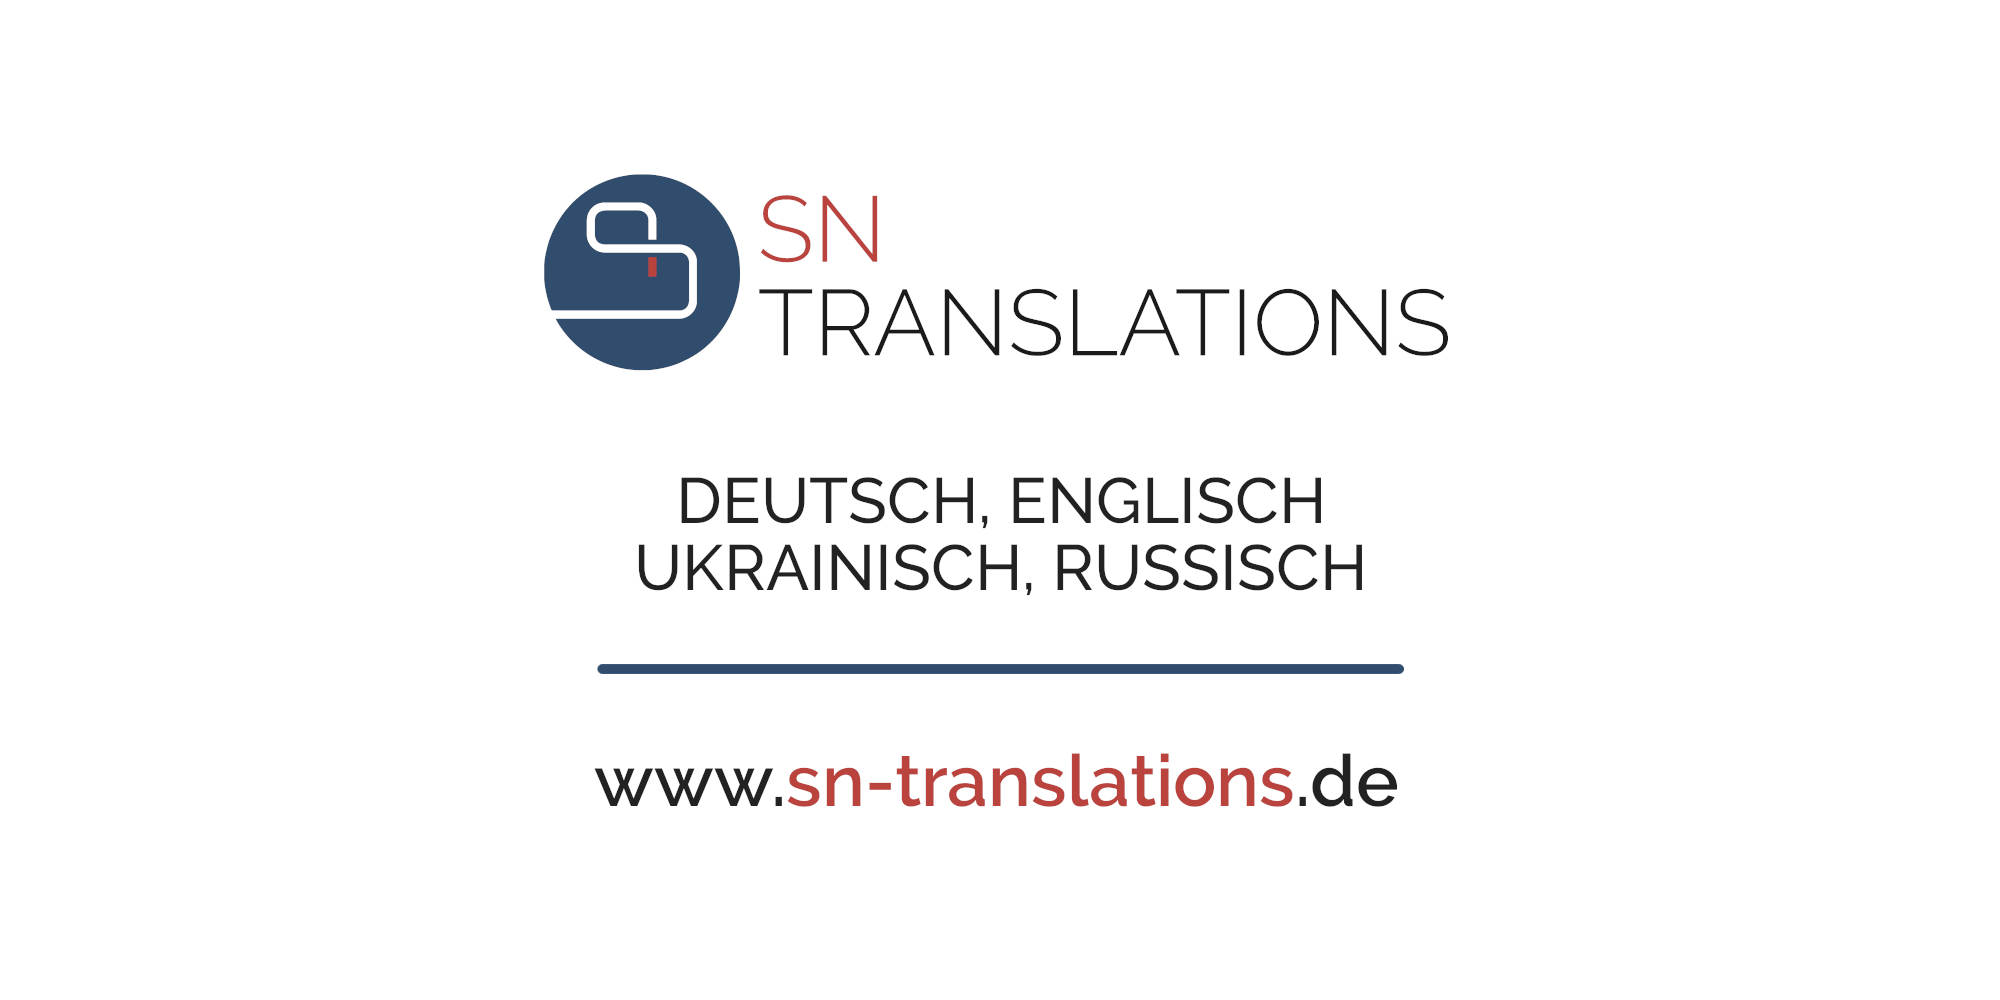 OpenGraph: Twitter - SN Translations • Übersetzungsbüro • Deutsch, Englisch, Ukrainisch, Russisch